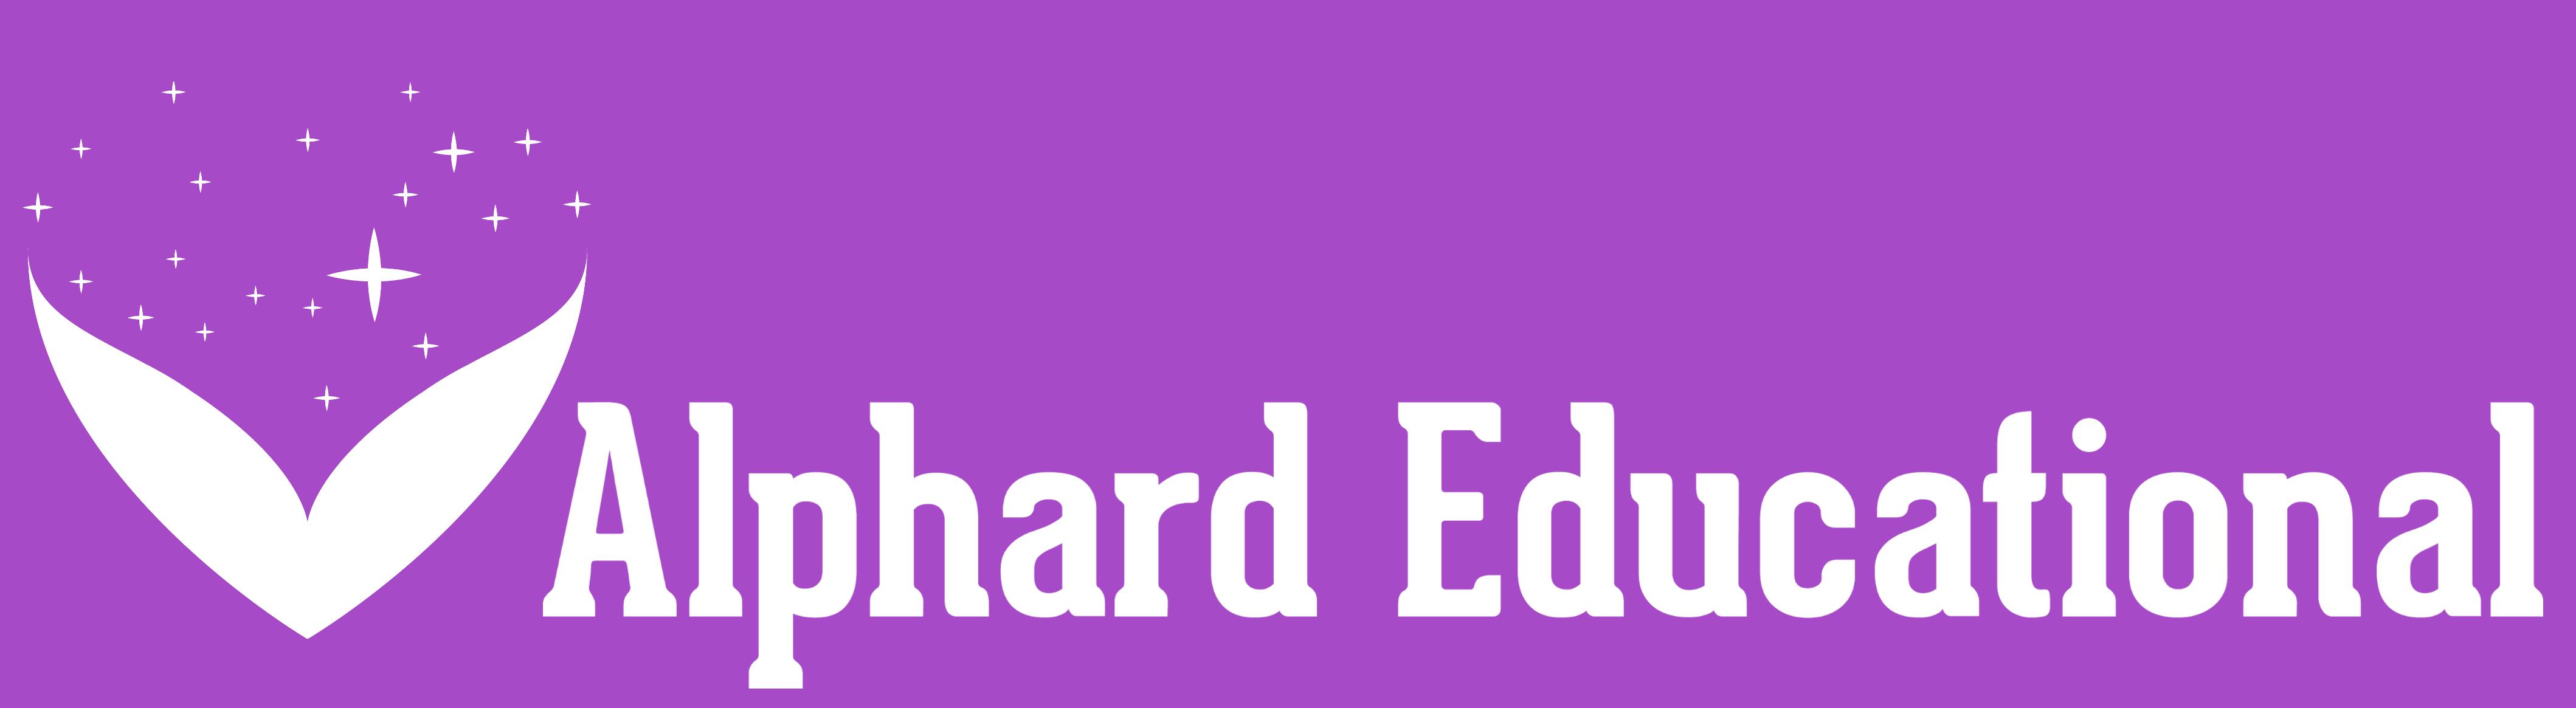 ALPHARD EDUCATIONAL & ANDREEA'S CLUB